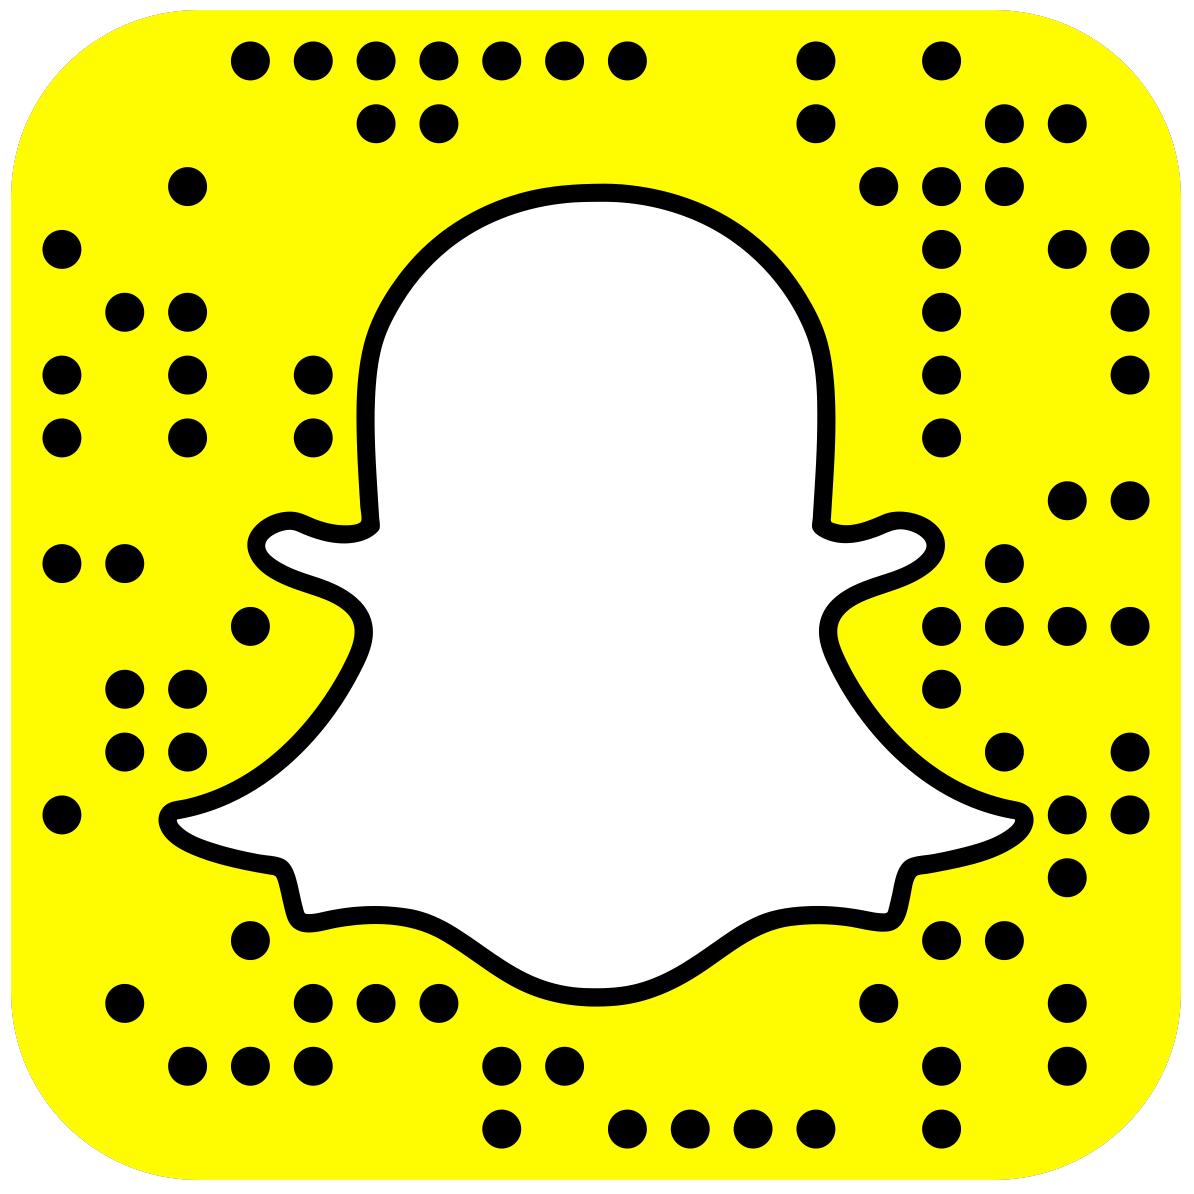 Shahid Kapoor Snapchat username